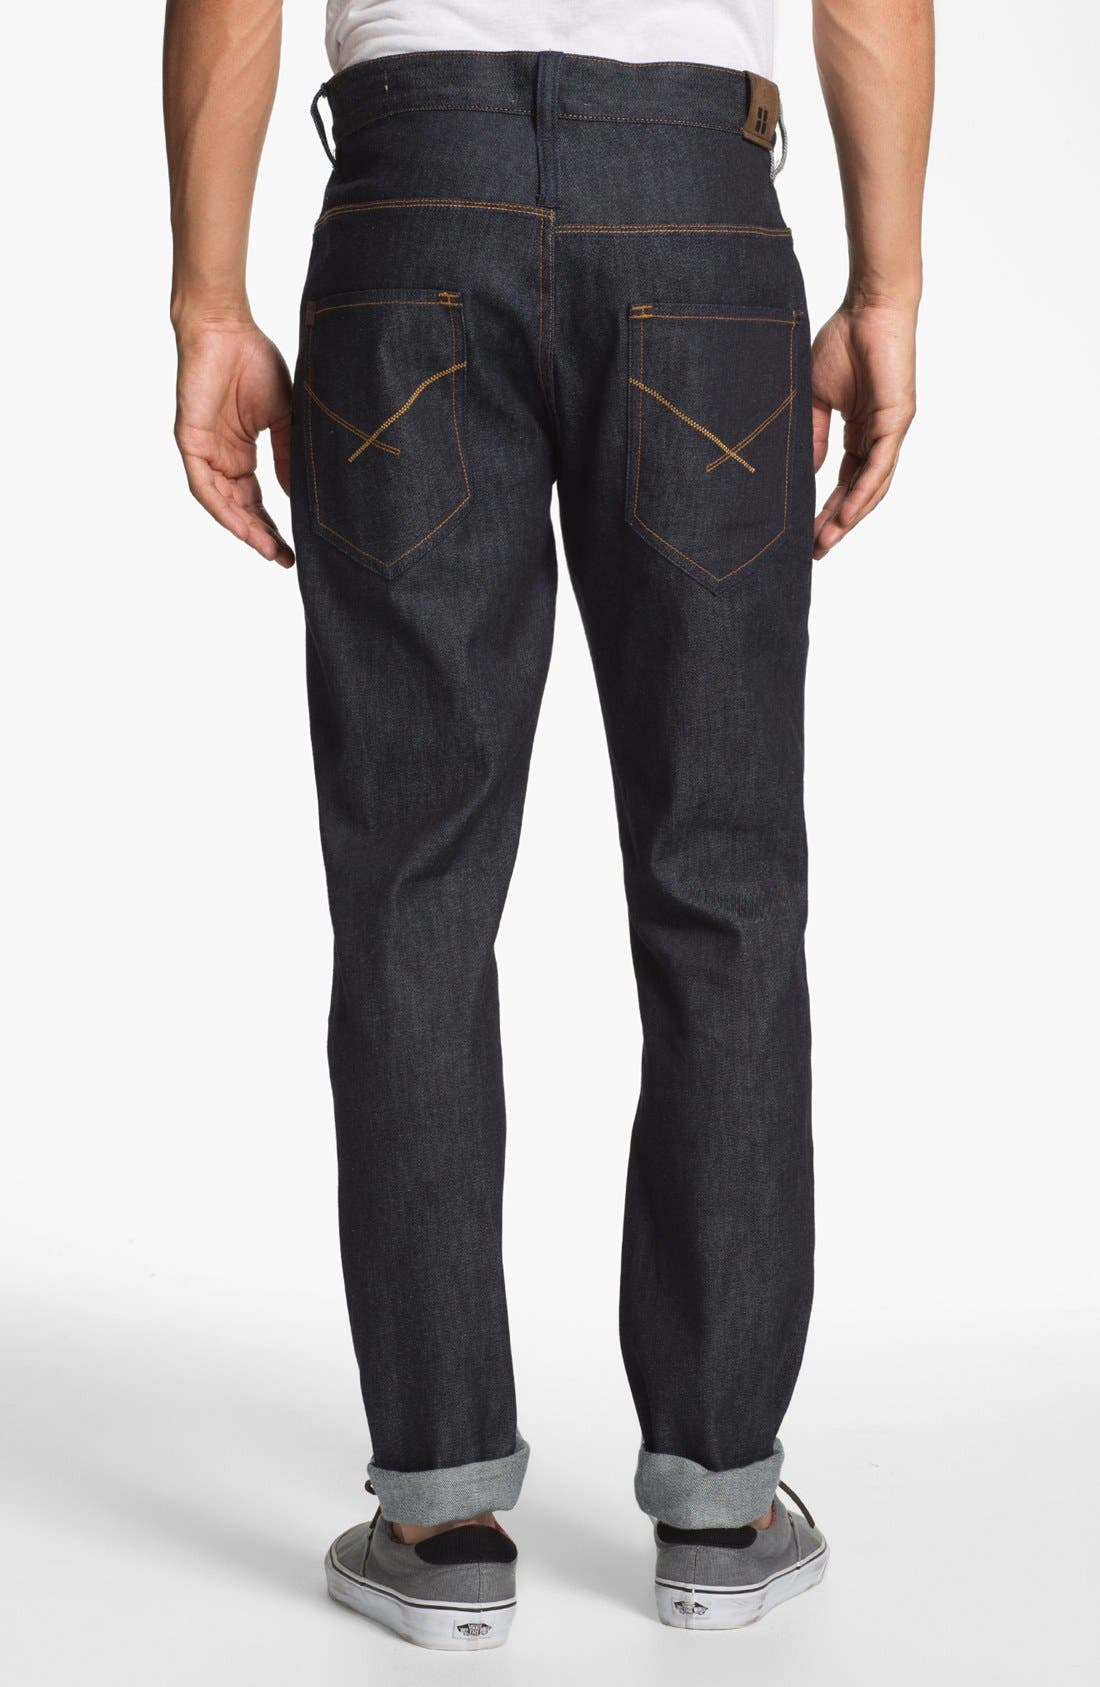 Main Image - Insight 'Loose Joints' Slim Leg Jeans (Indigo Raw)